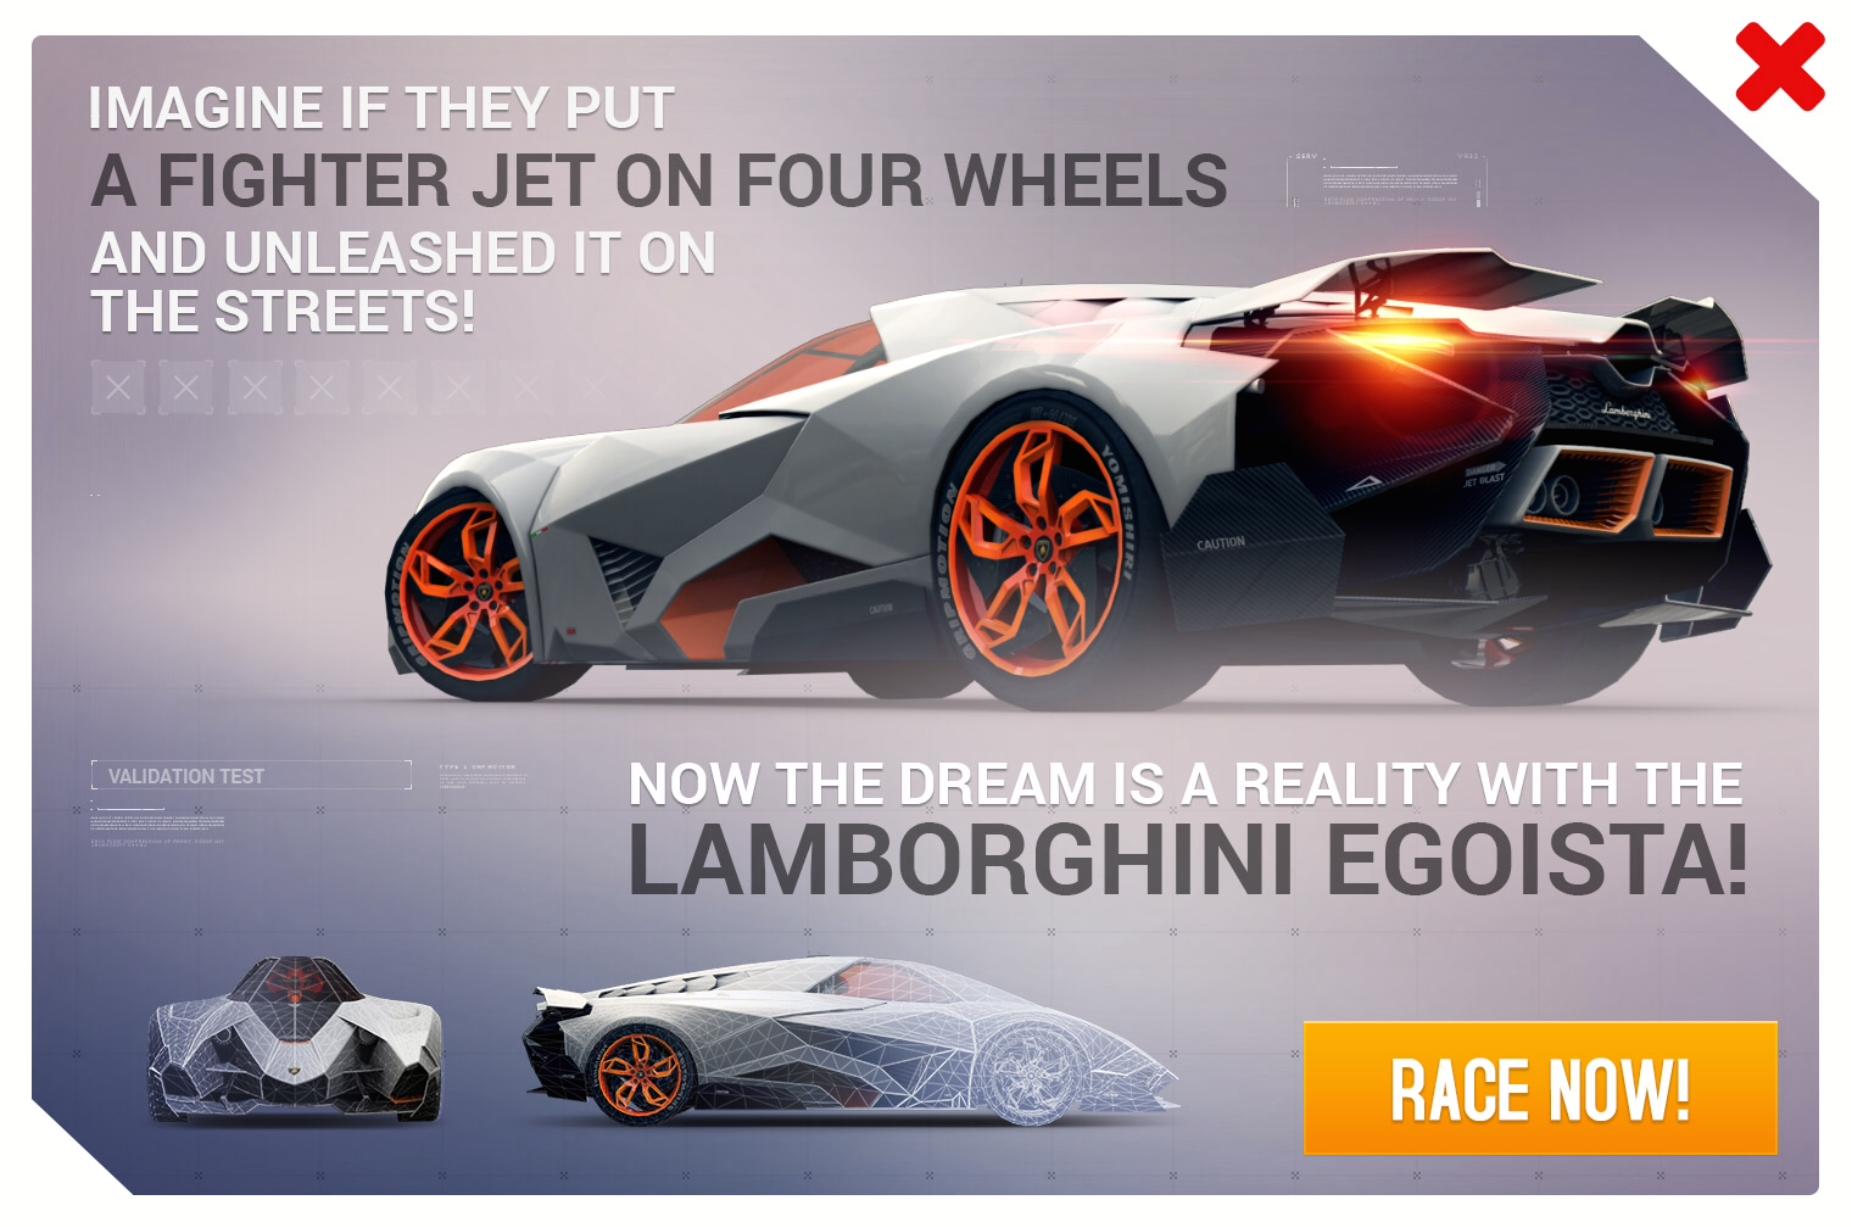 latest?cb=20160130204739 Surprising Lamborghini Countach 25th Anniversary asphalt 8 Cars Trend